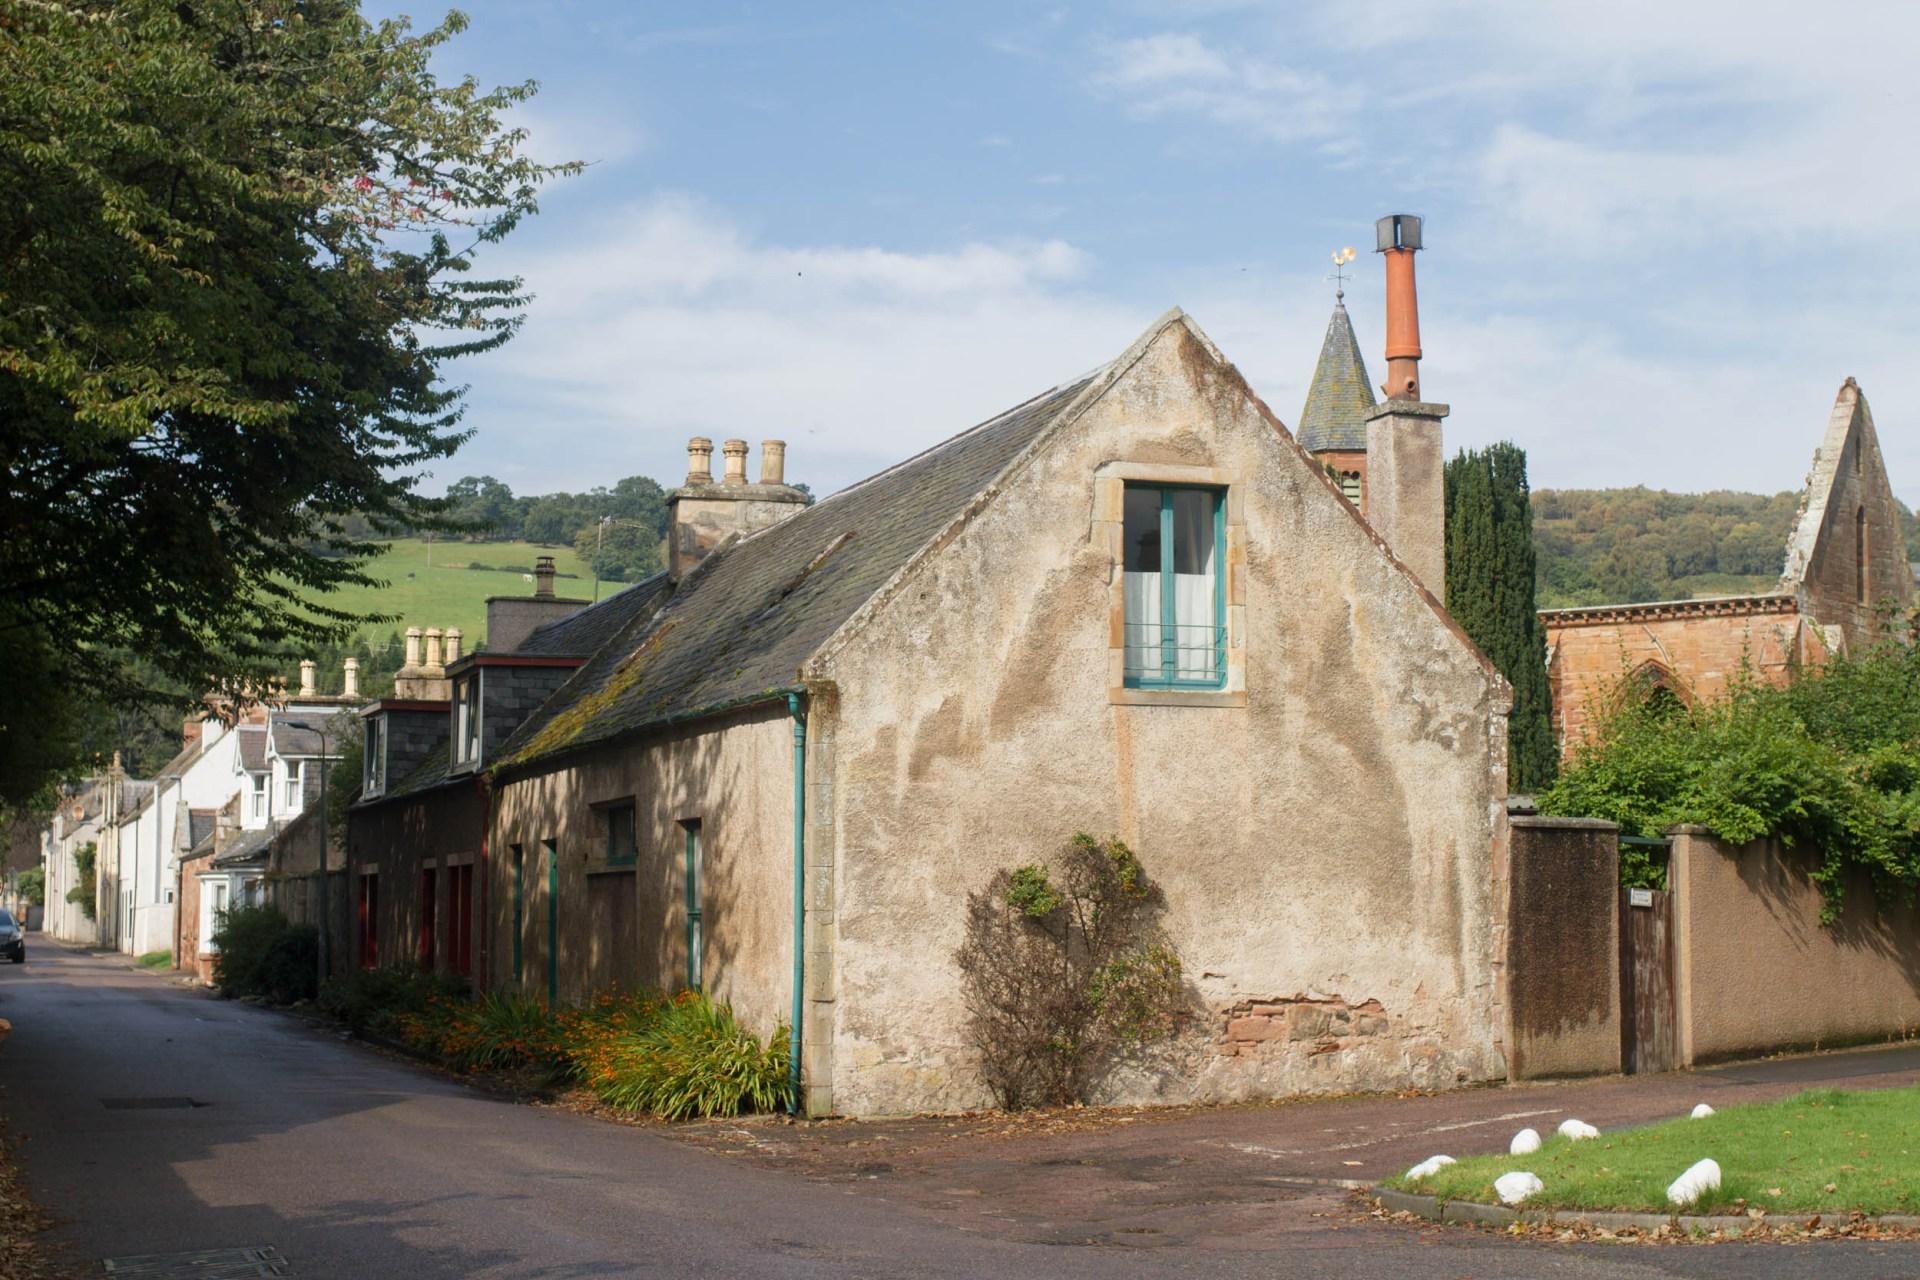 Image of Fortrose, Scotland